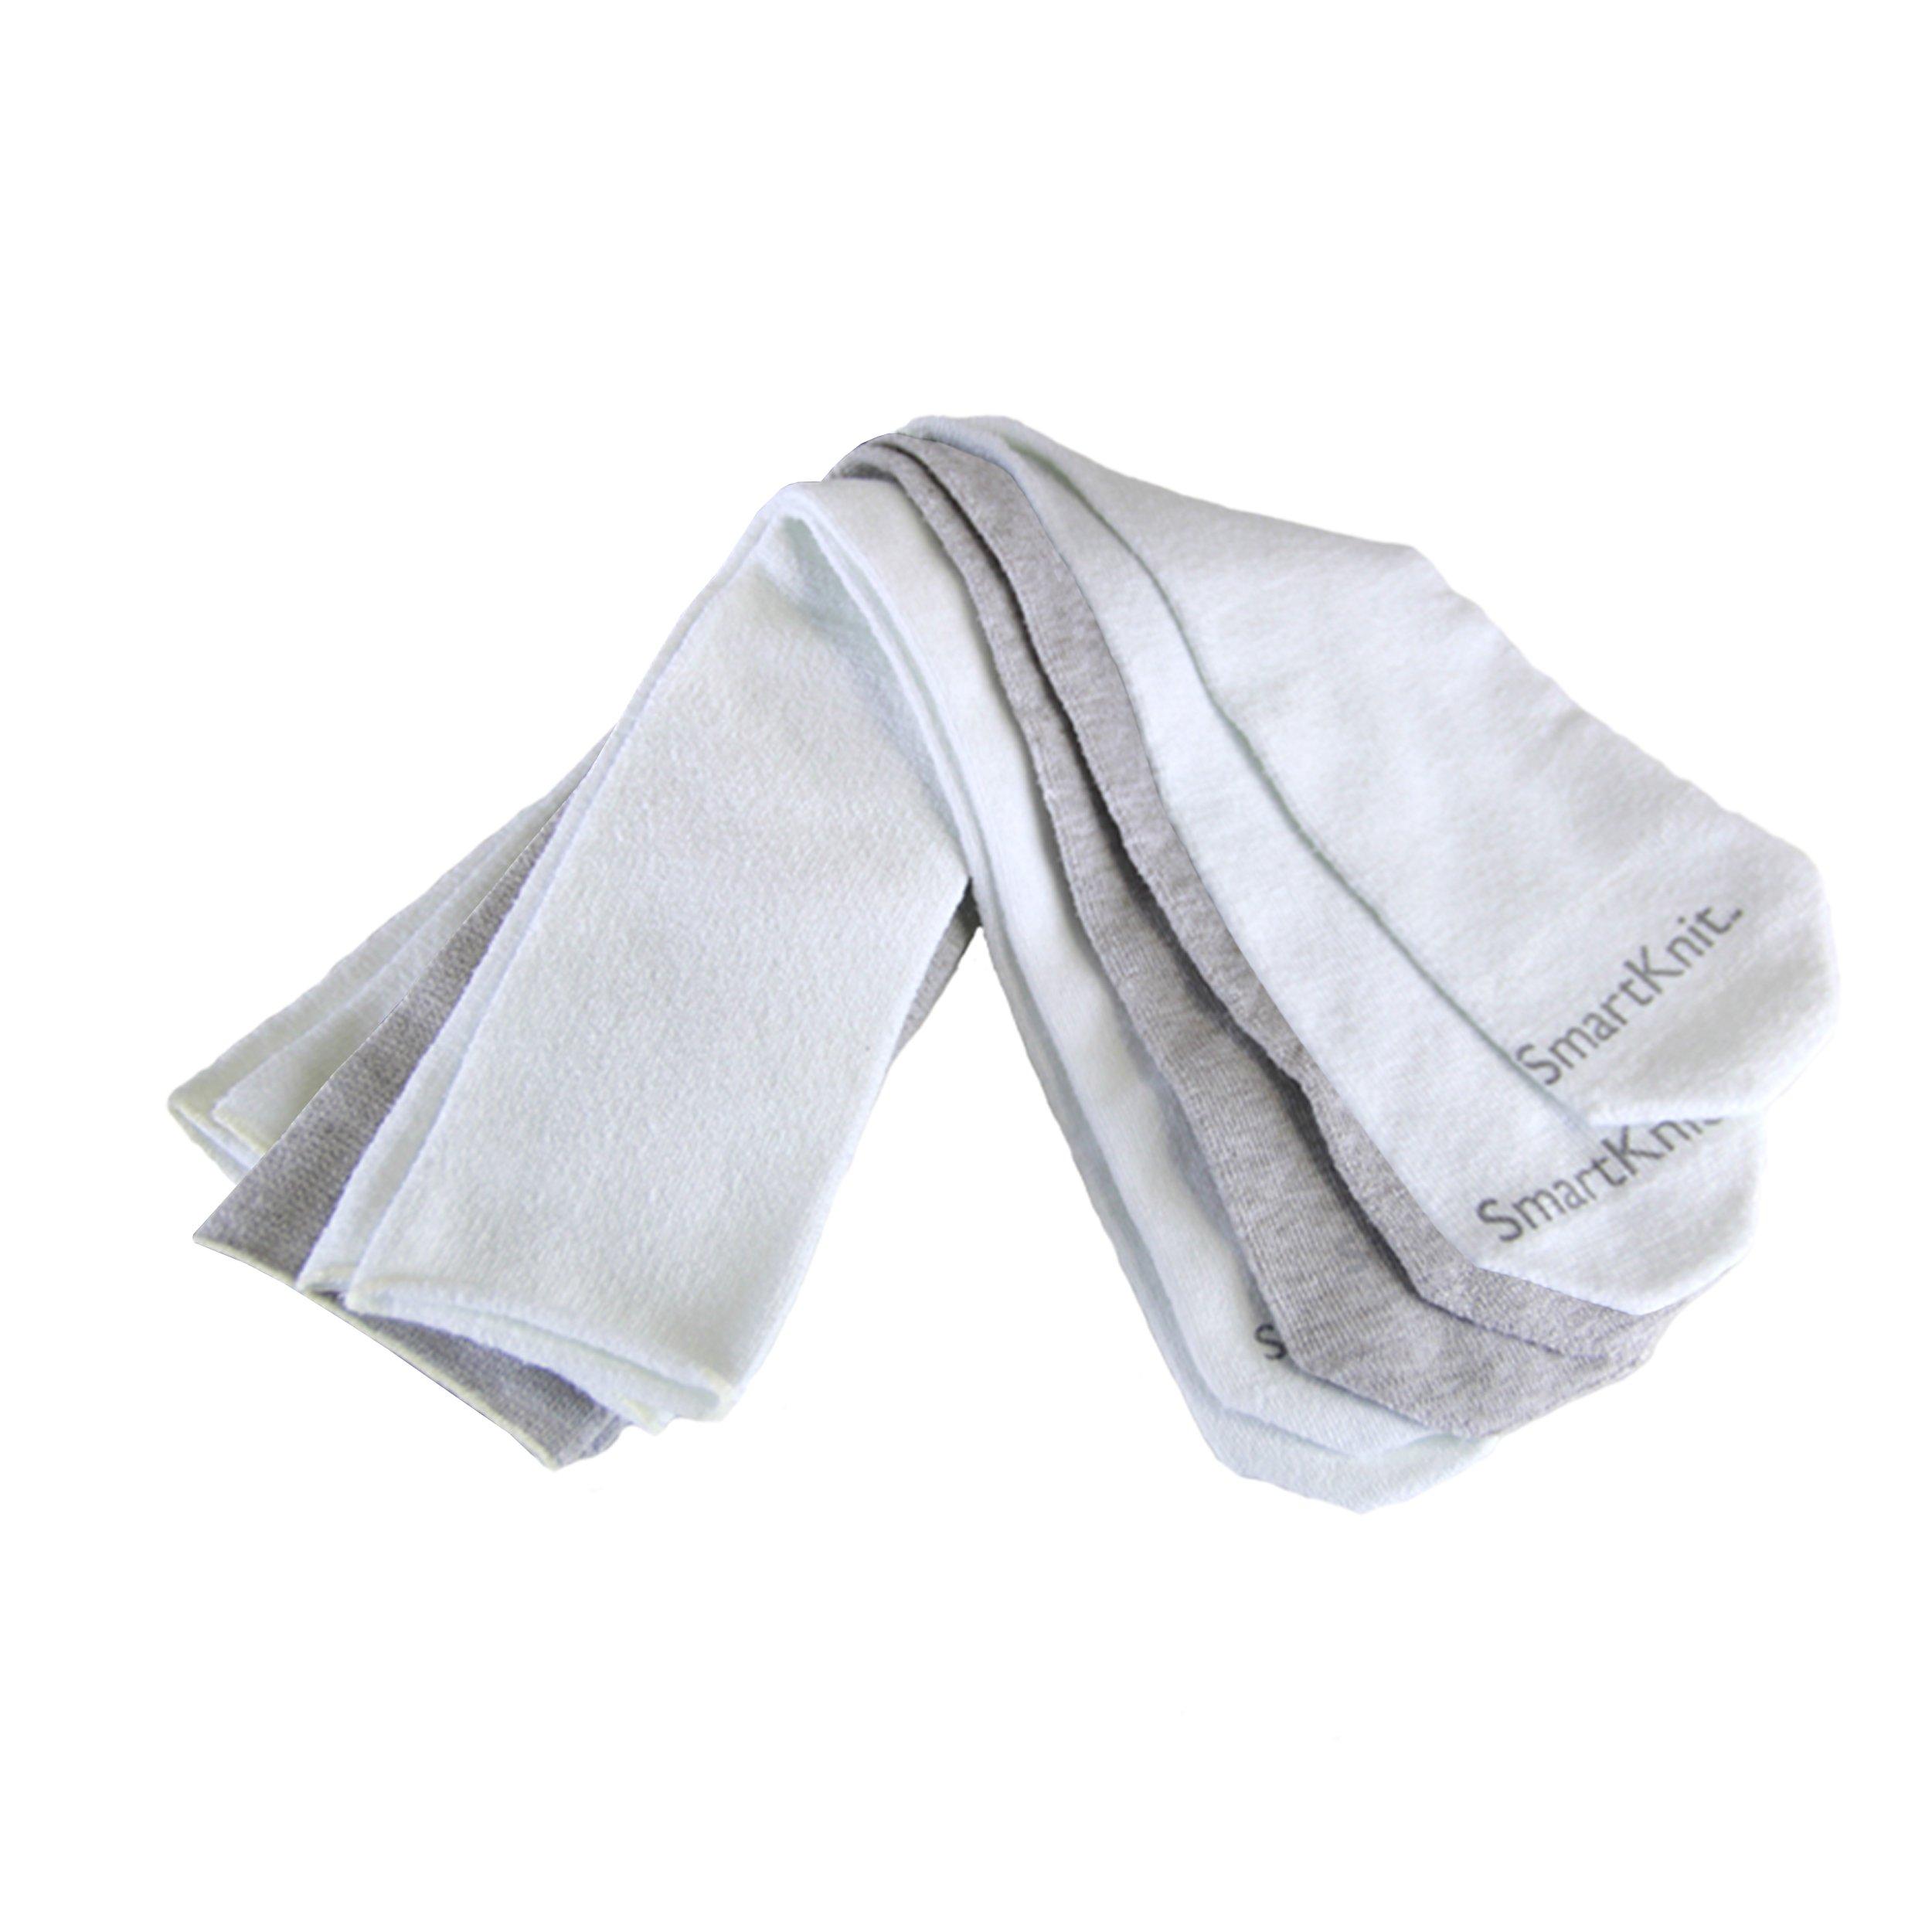 SmartKnit Seamless AFO Interface Socks 3 Pack - Adult Regular - White White & Gray by SmartKnit